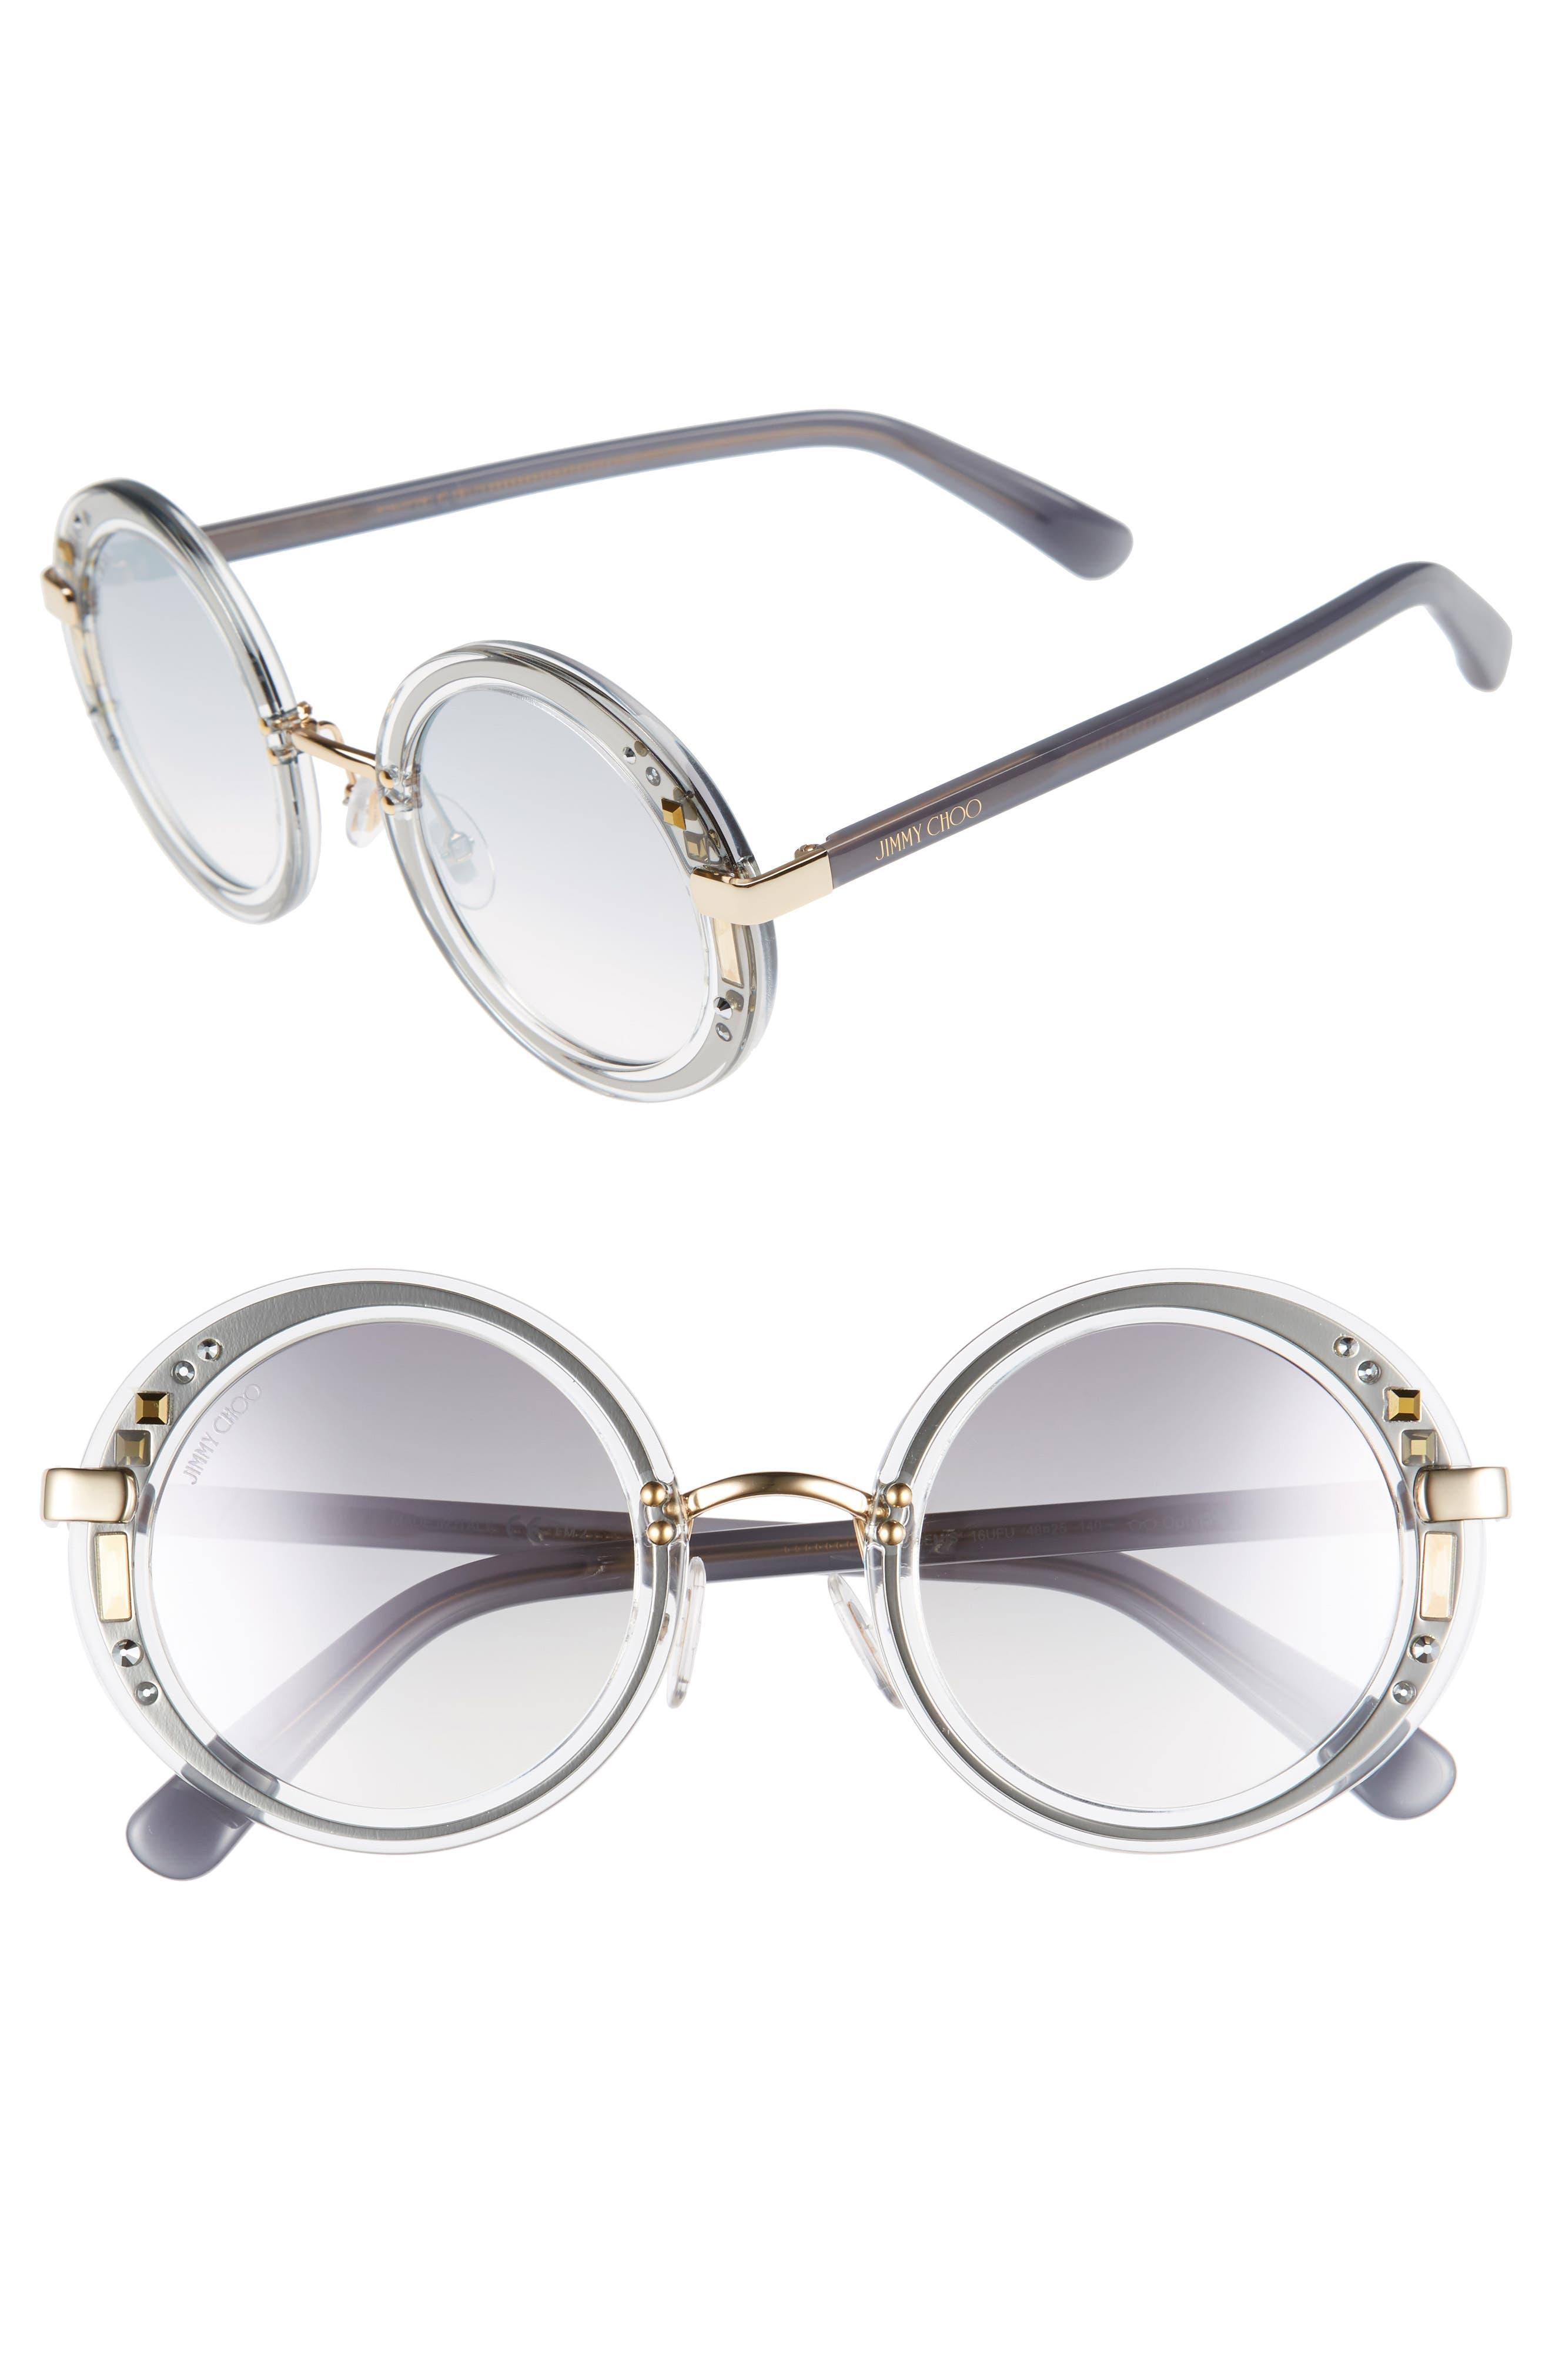 Alternate Image 1 Selected - Jimmy Choo Gems 48mm Round Sunglasses